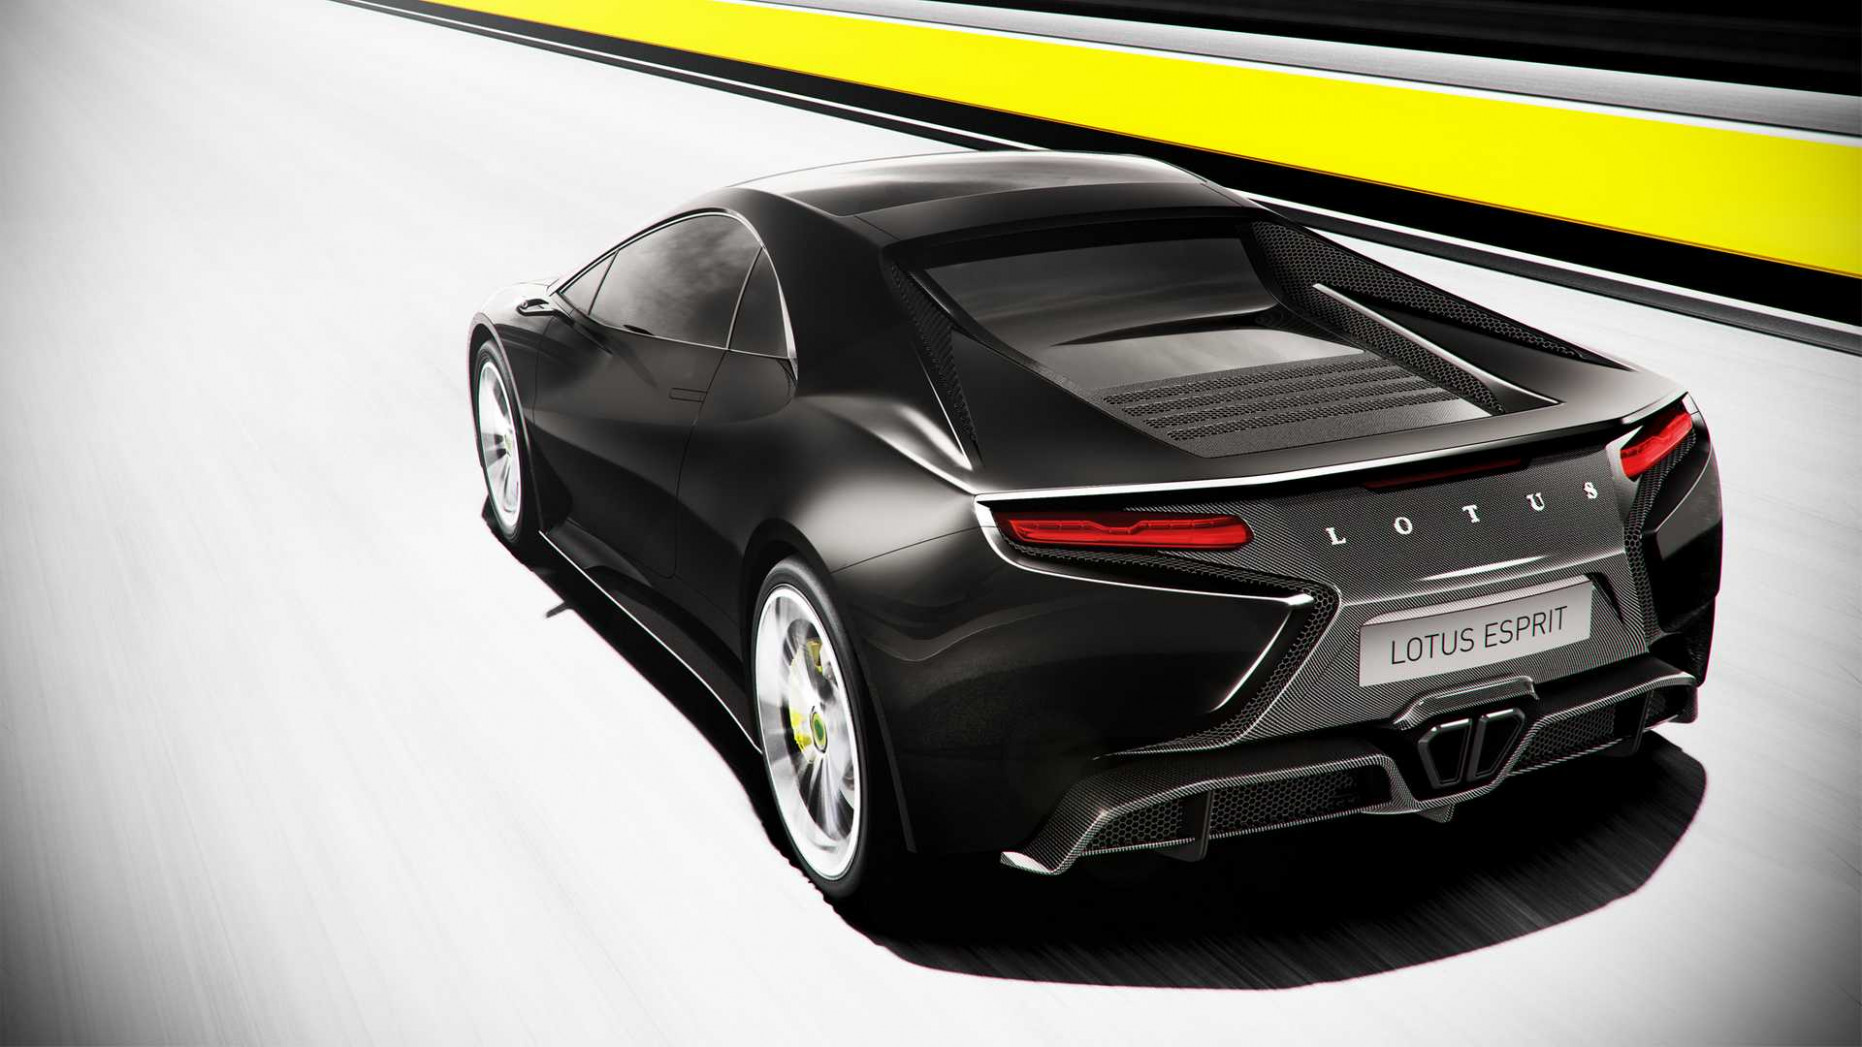 Rumors 2022 Lotus Esprit